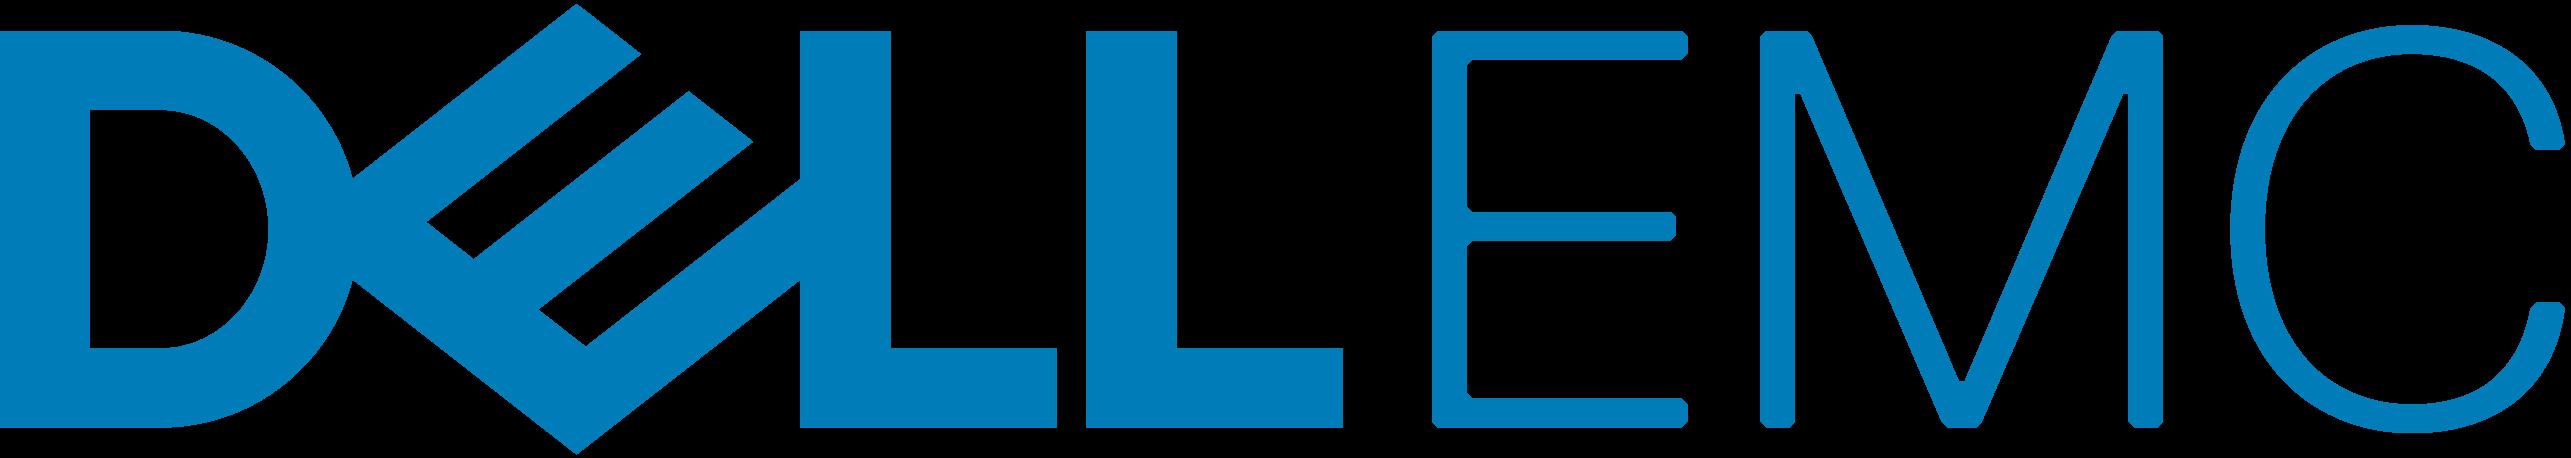 DellEMC Logo Prm Blue Rgb